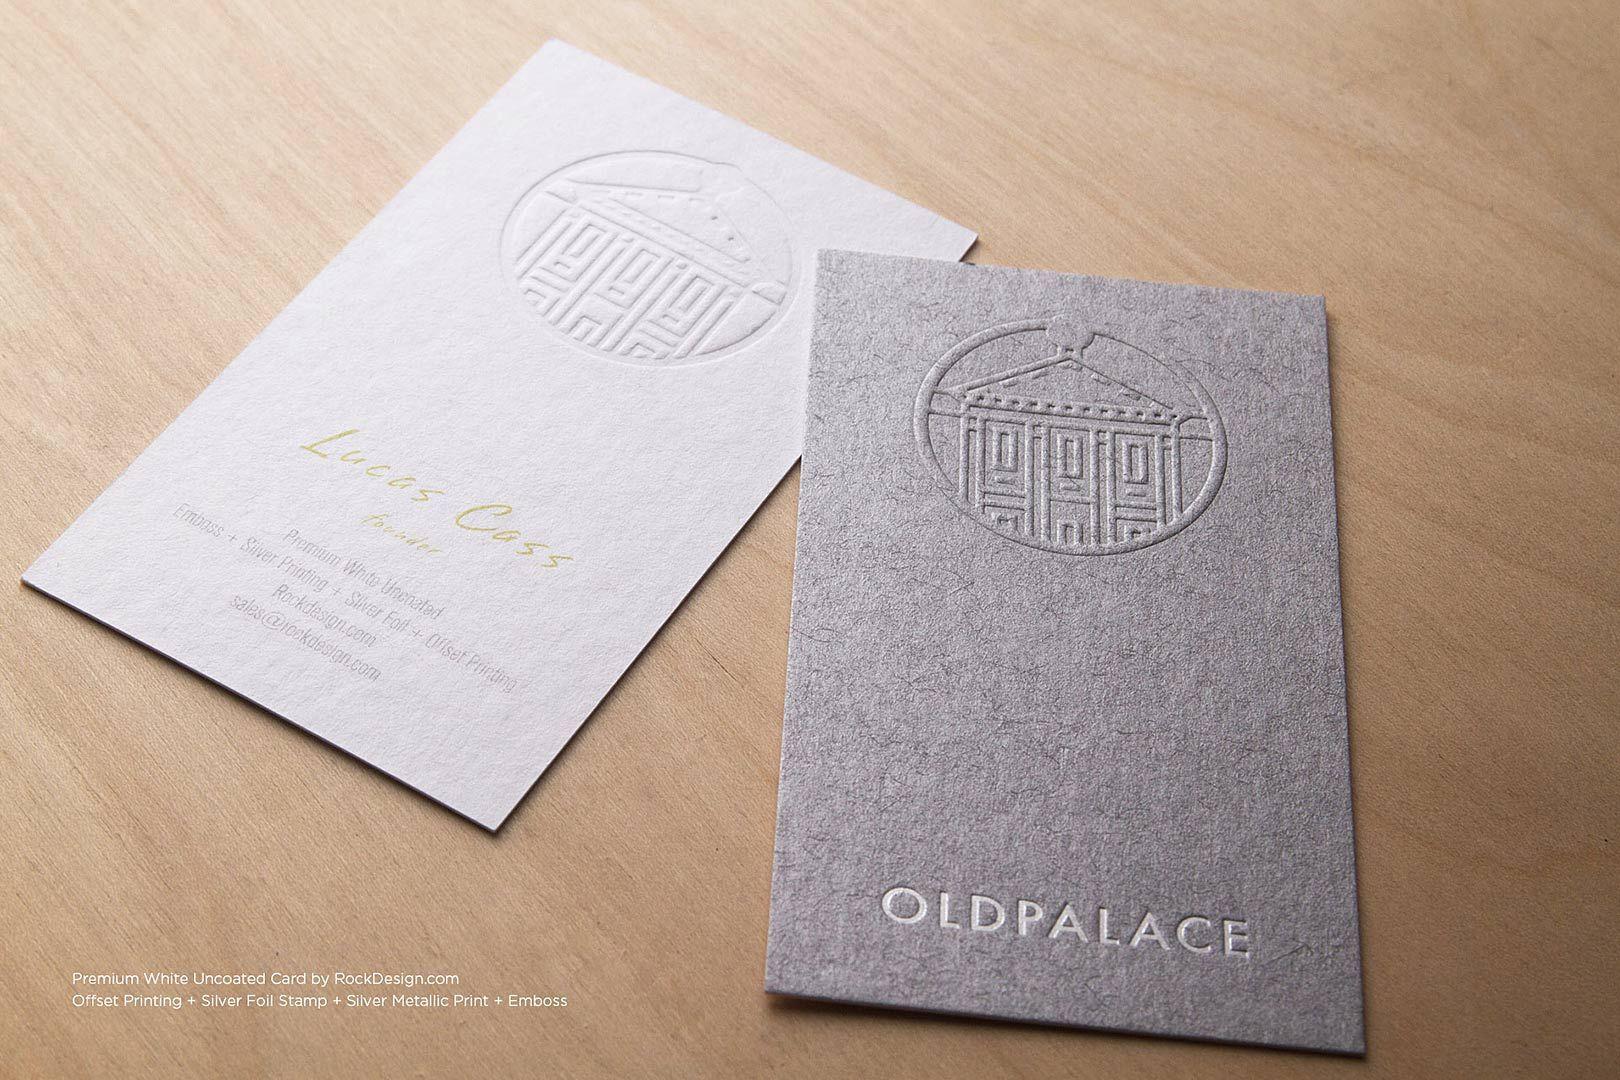 Premium name card template rockdesign luxury business card premium name card template rockdesign luxury business card printing colourmoves